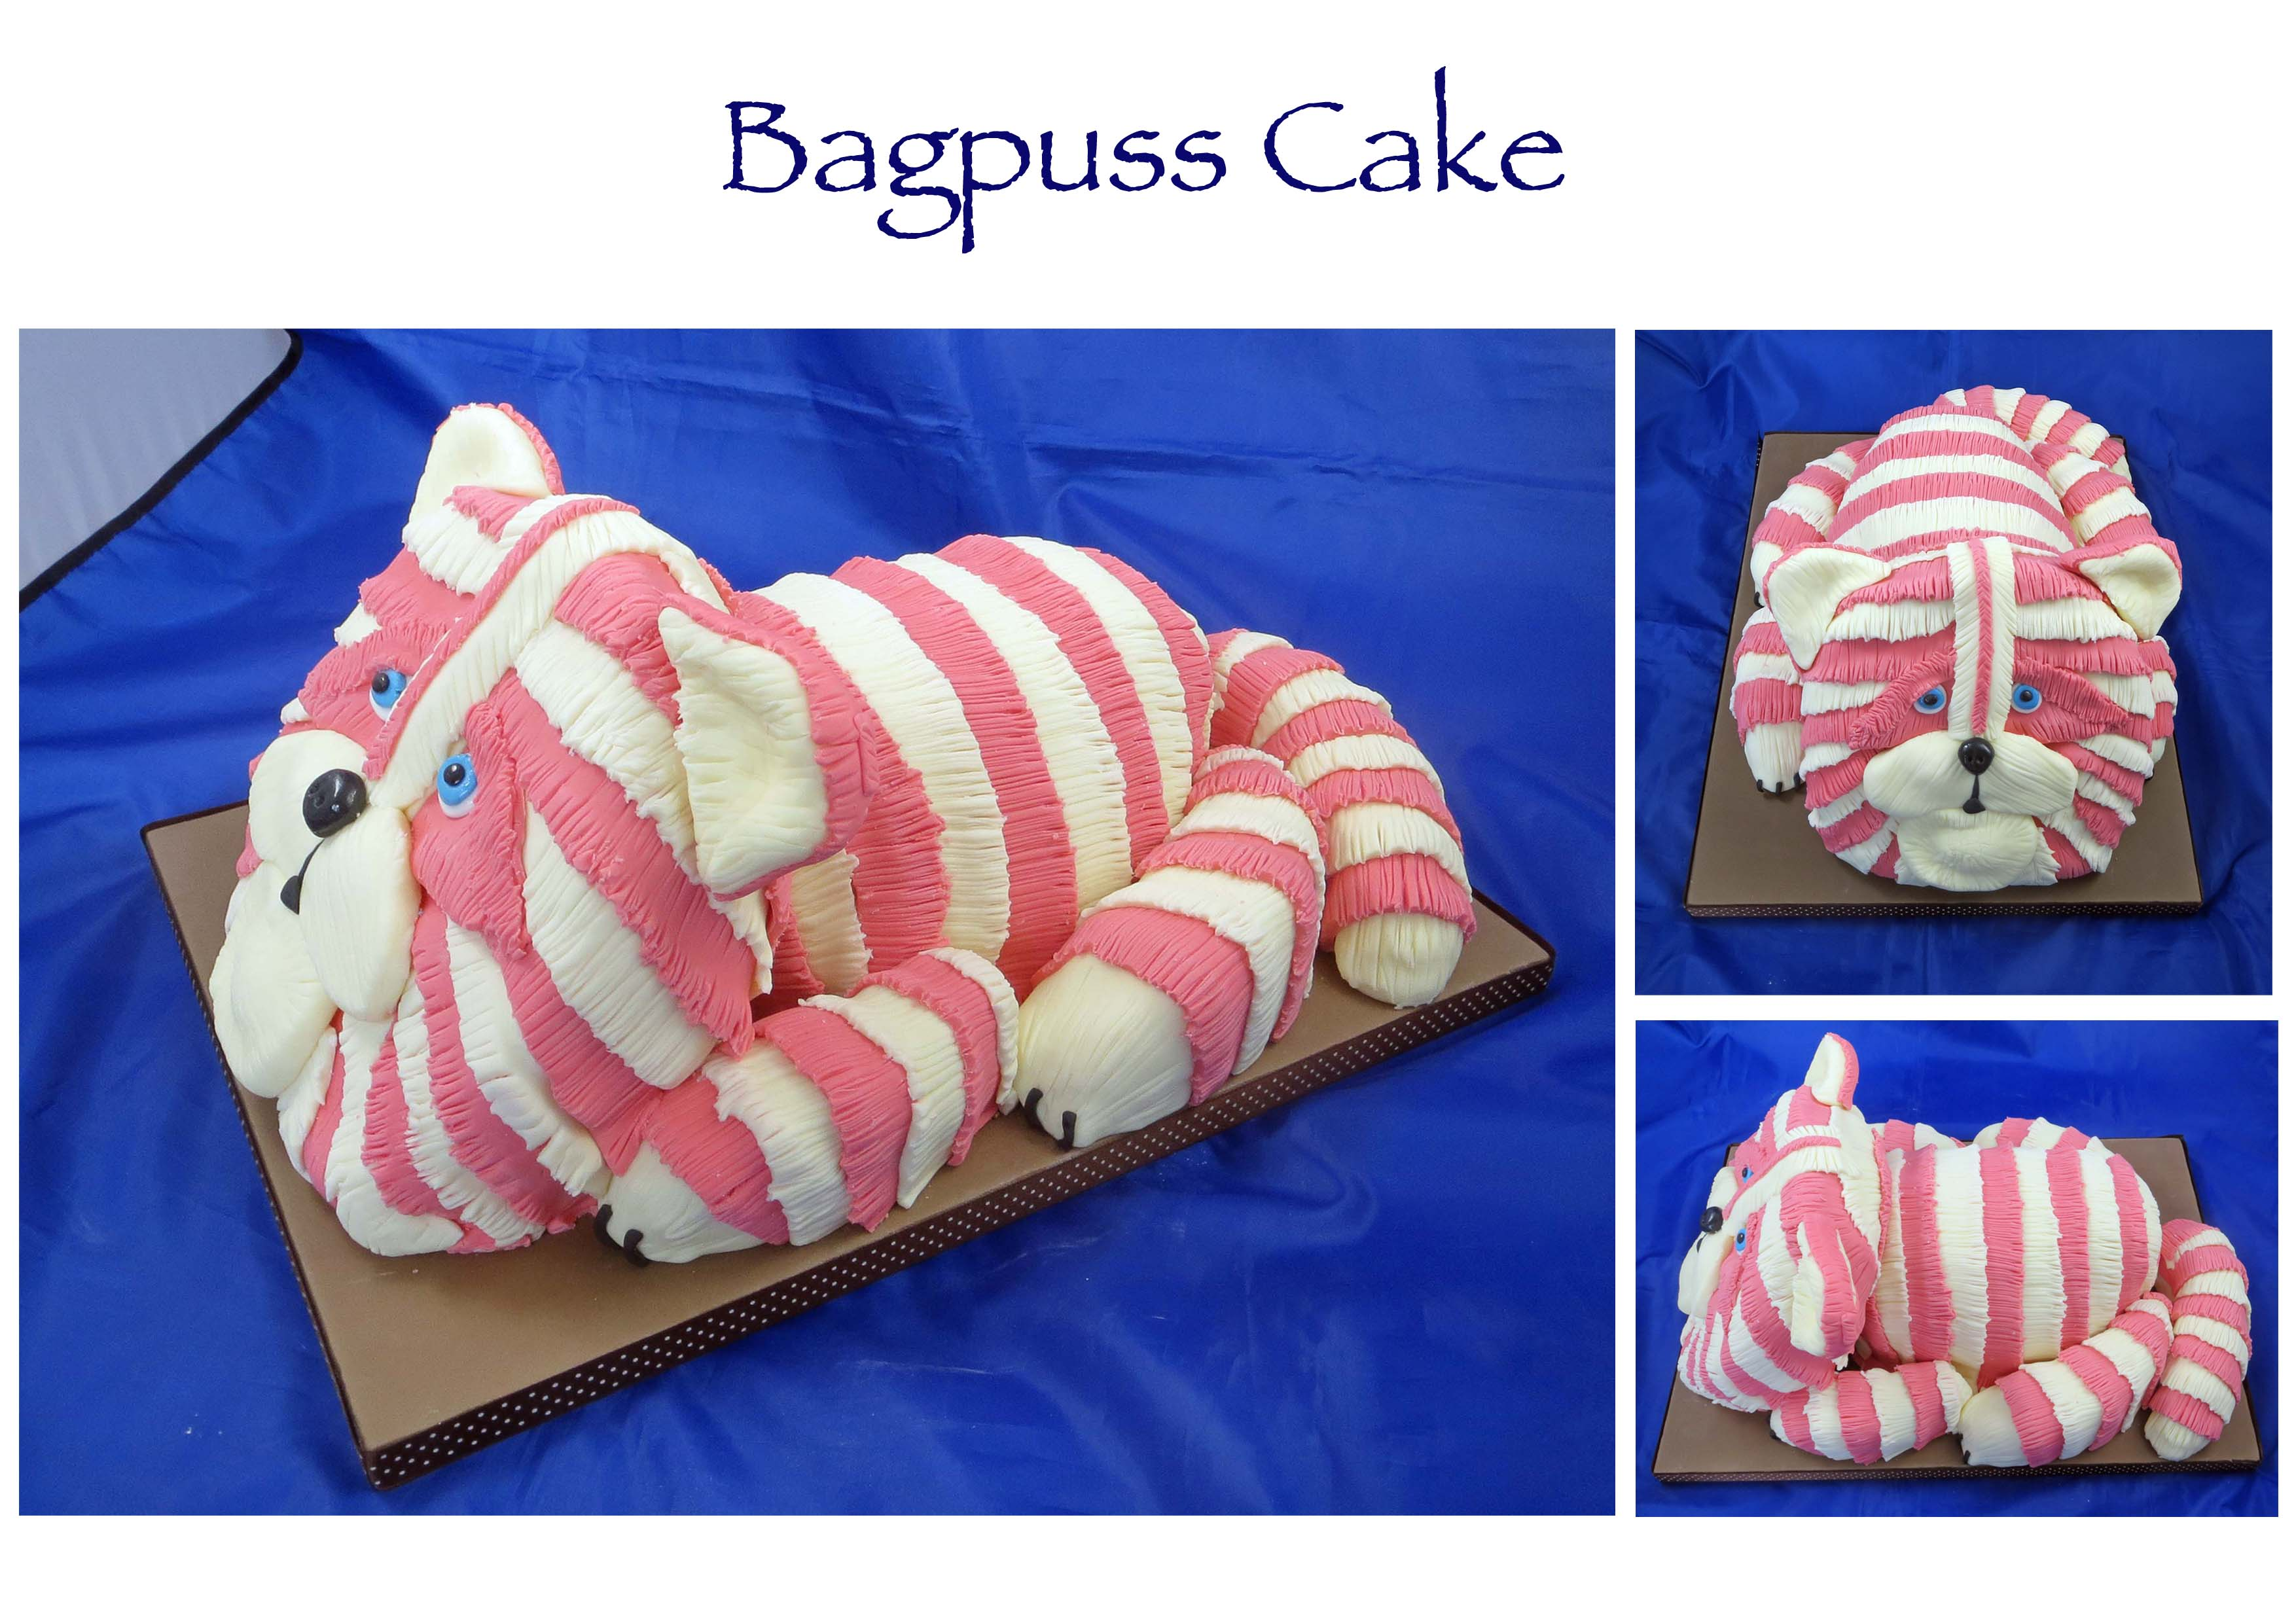 Bagpuss Cake